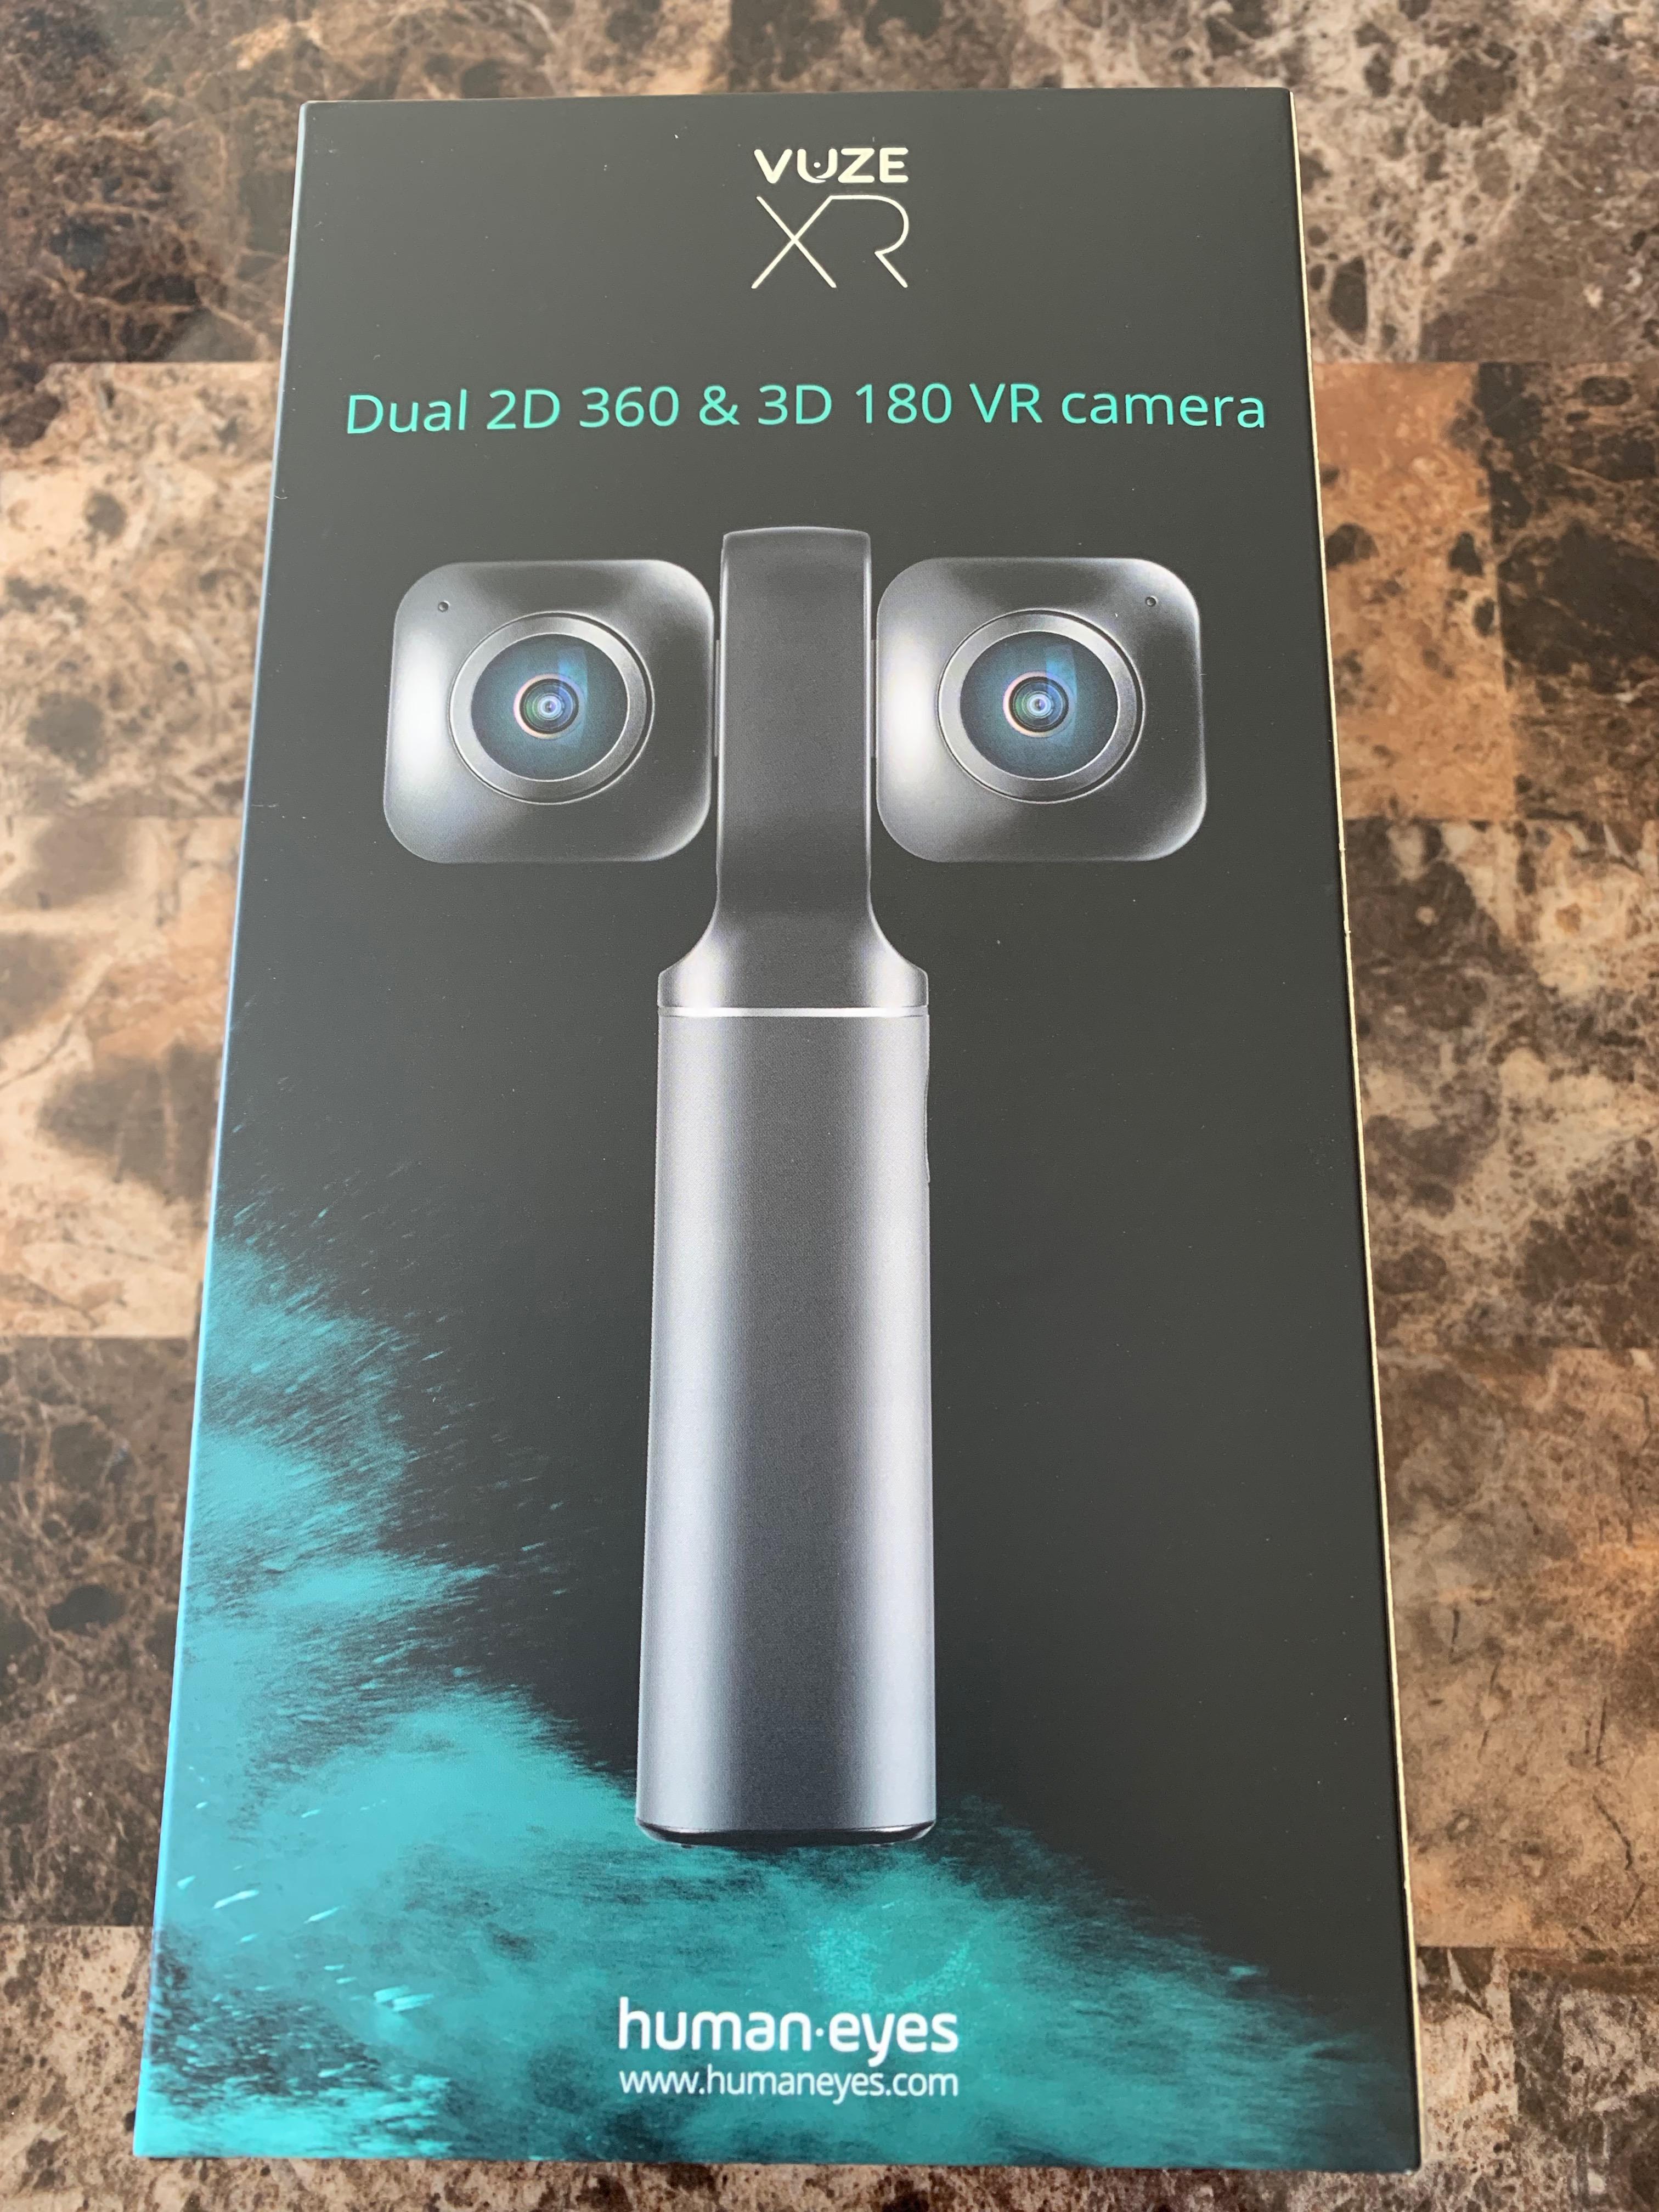 Unboxing a Vuze XR Camera